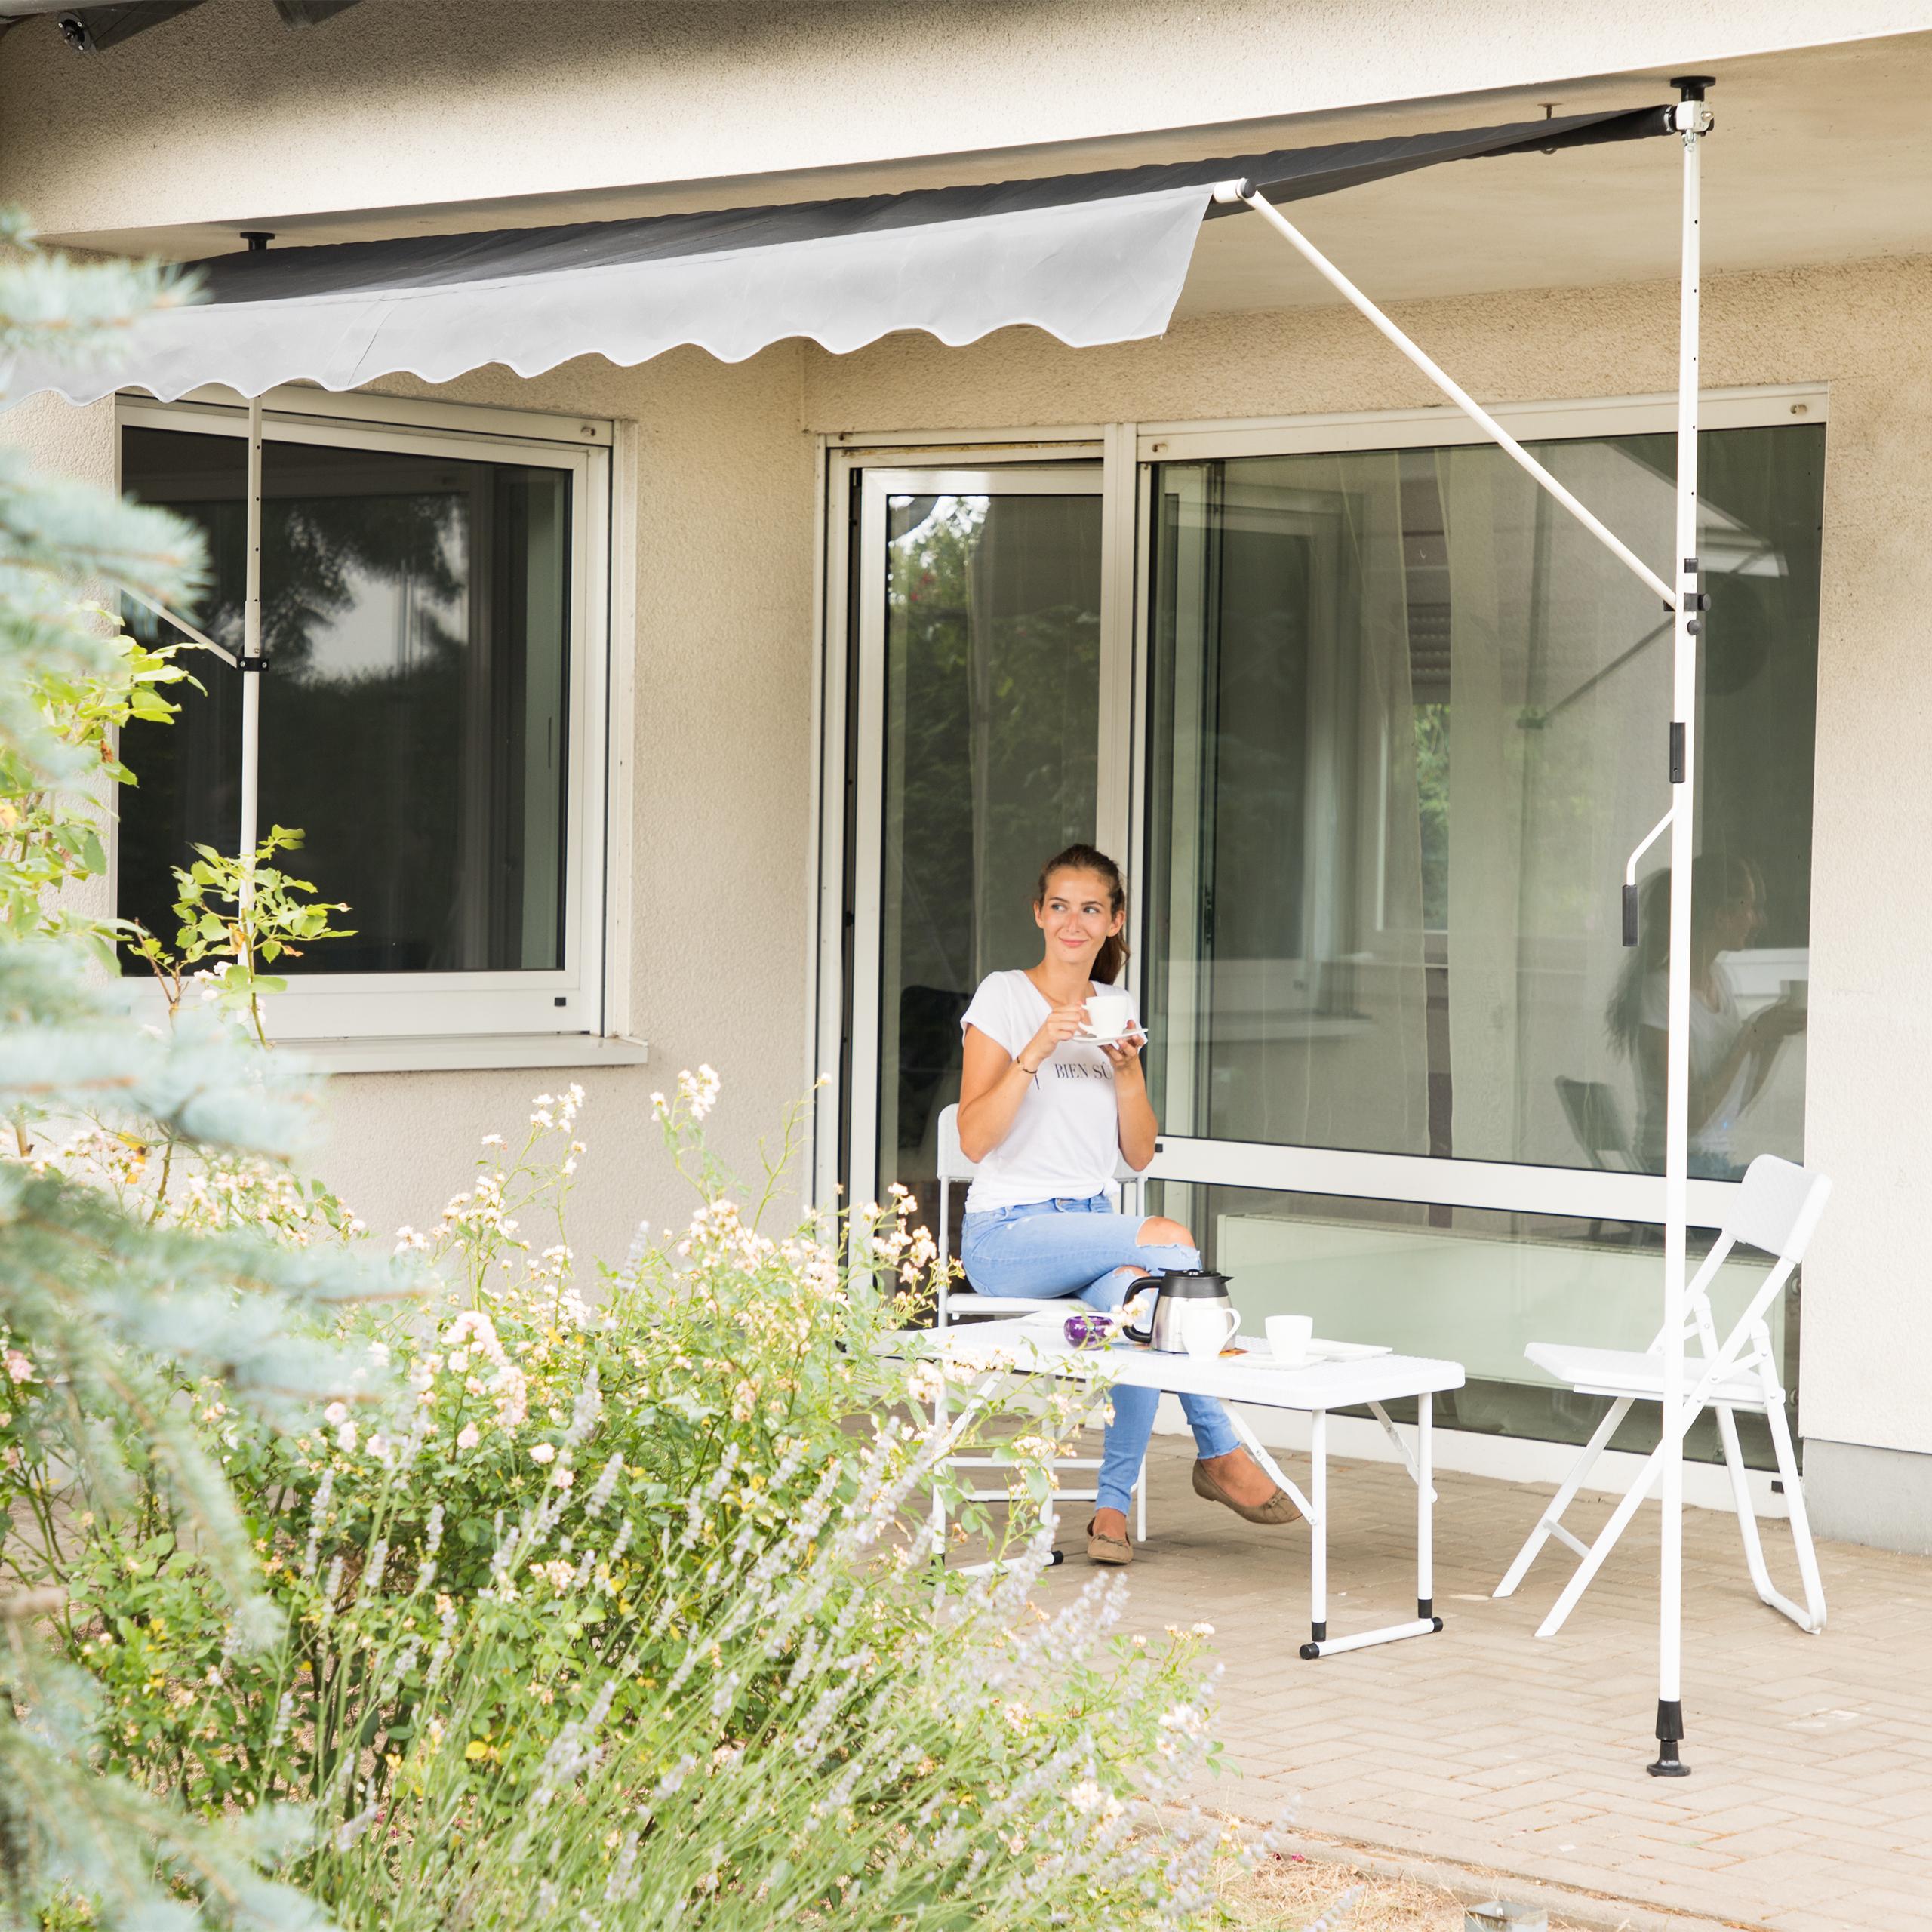 Klemmmarkise Balkon Markise Balkonmarkise Sonnenmarkise Sonnendach grau Gestell